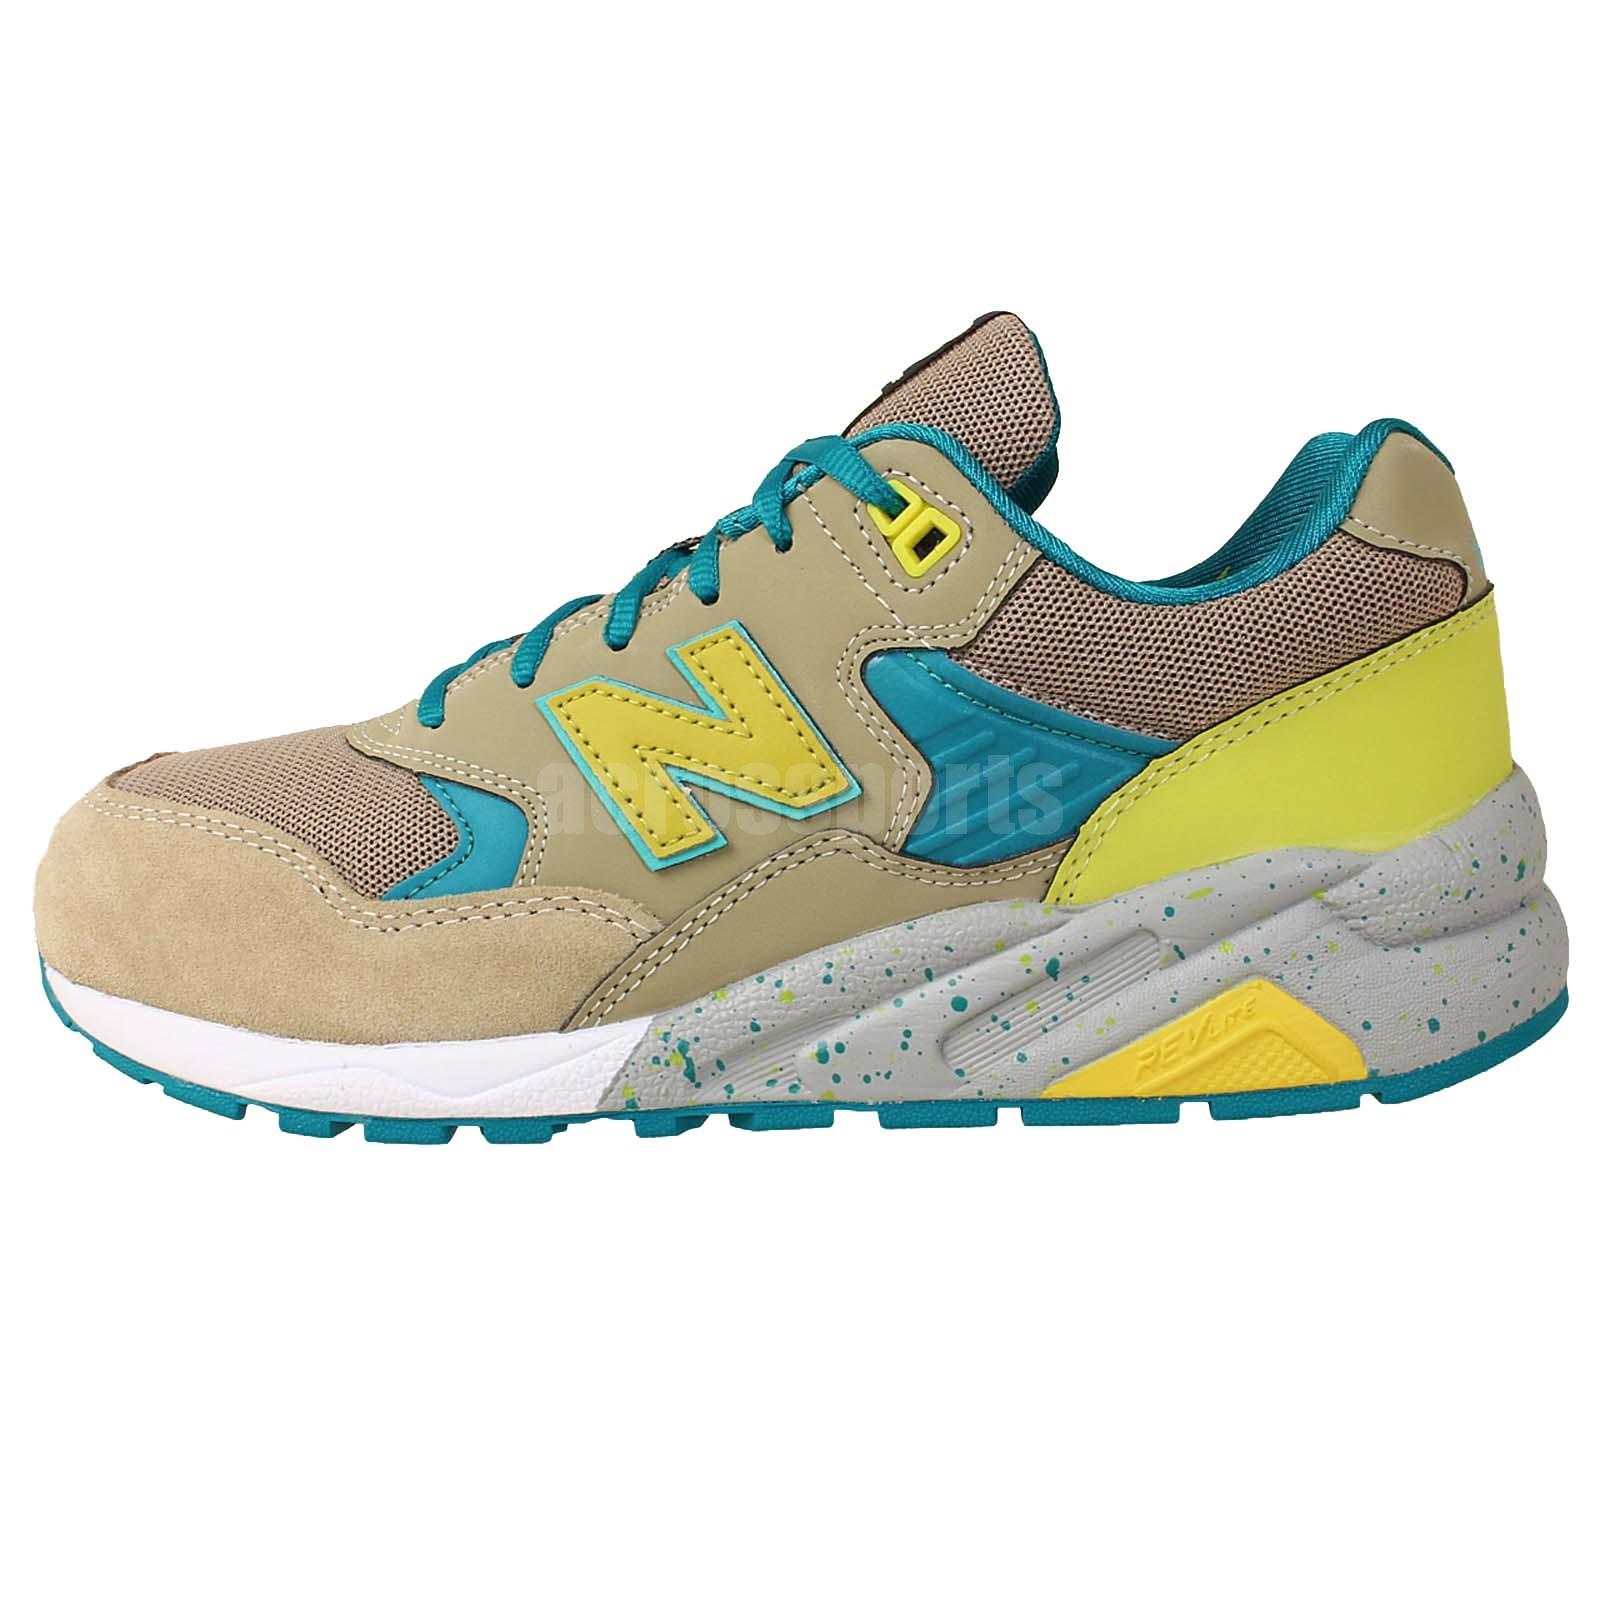 new balance mrt580bs dkhaki yellow green 2014 mens revlite running shoes sneaker. Black Bedroom Furniture Sets. Home Design Ideas